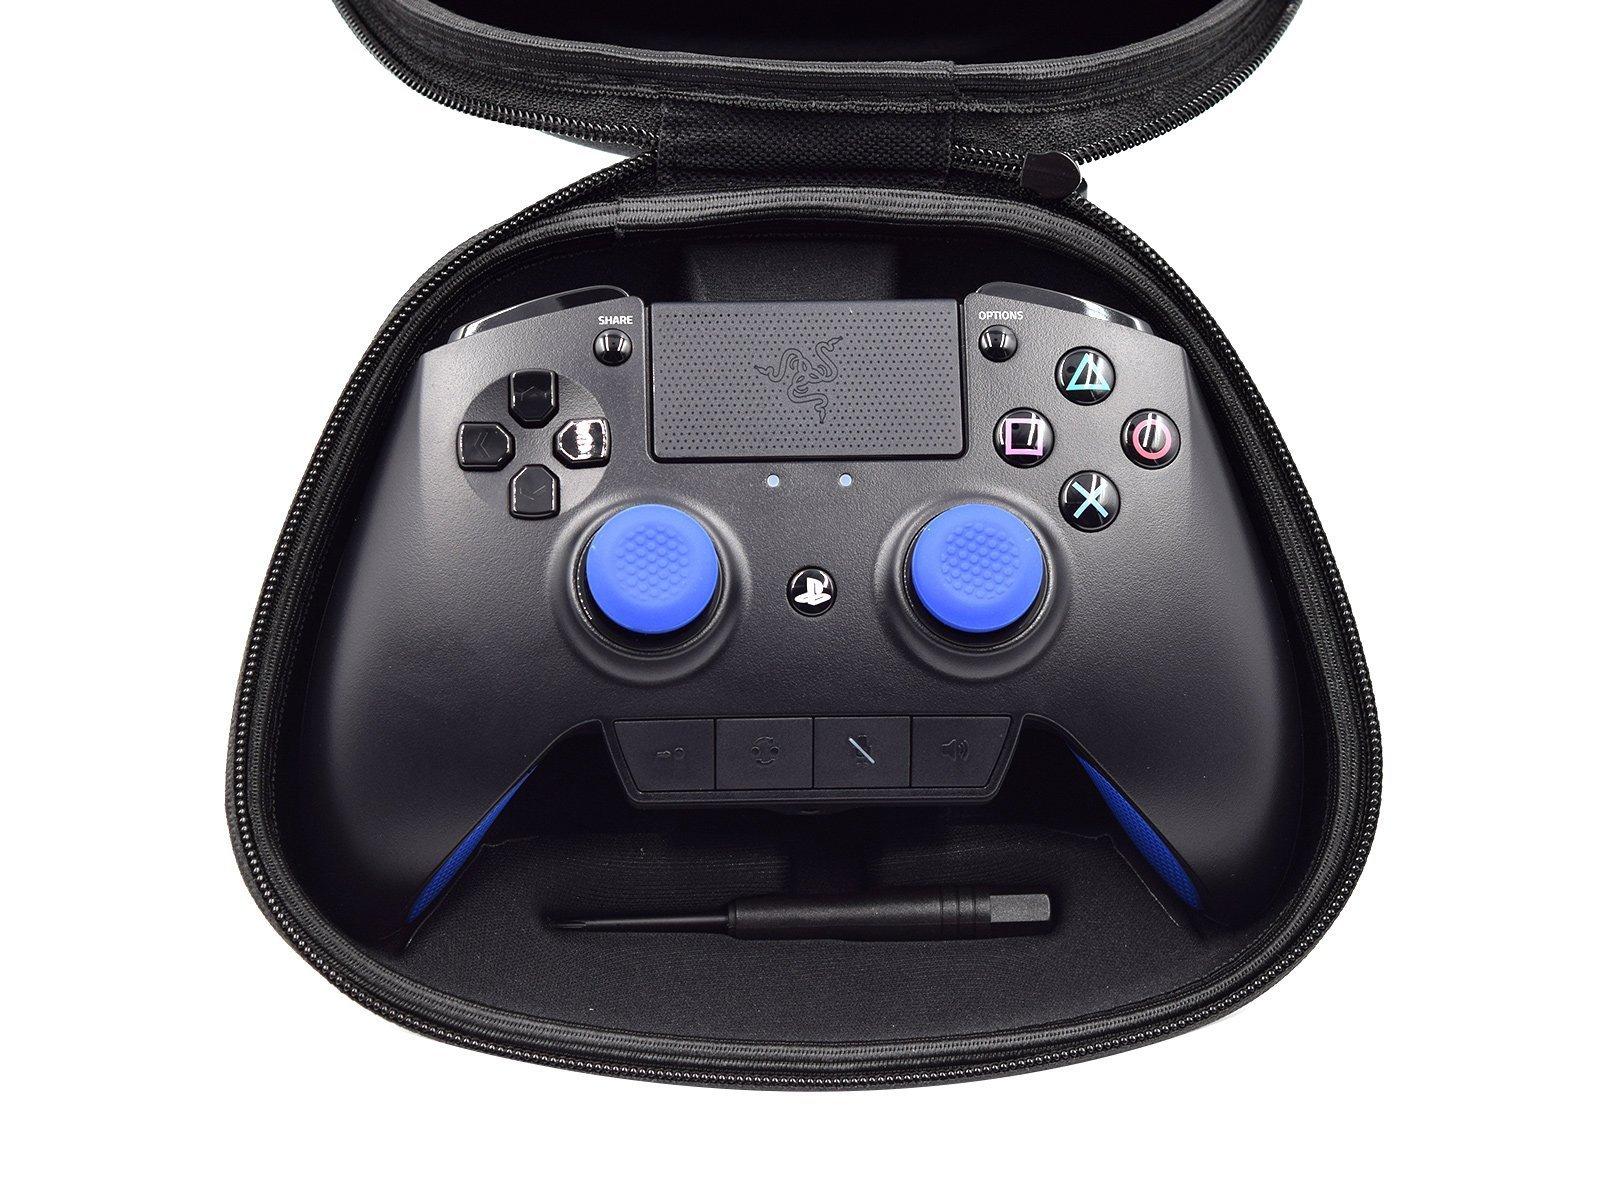 Razer Raiju Gaming Controller View 1